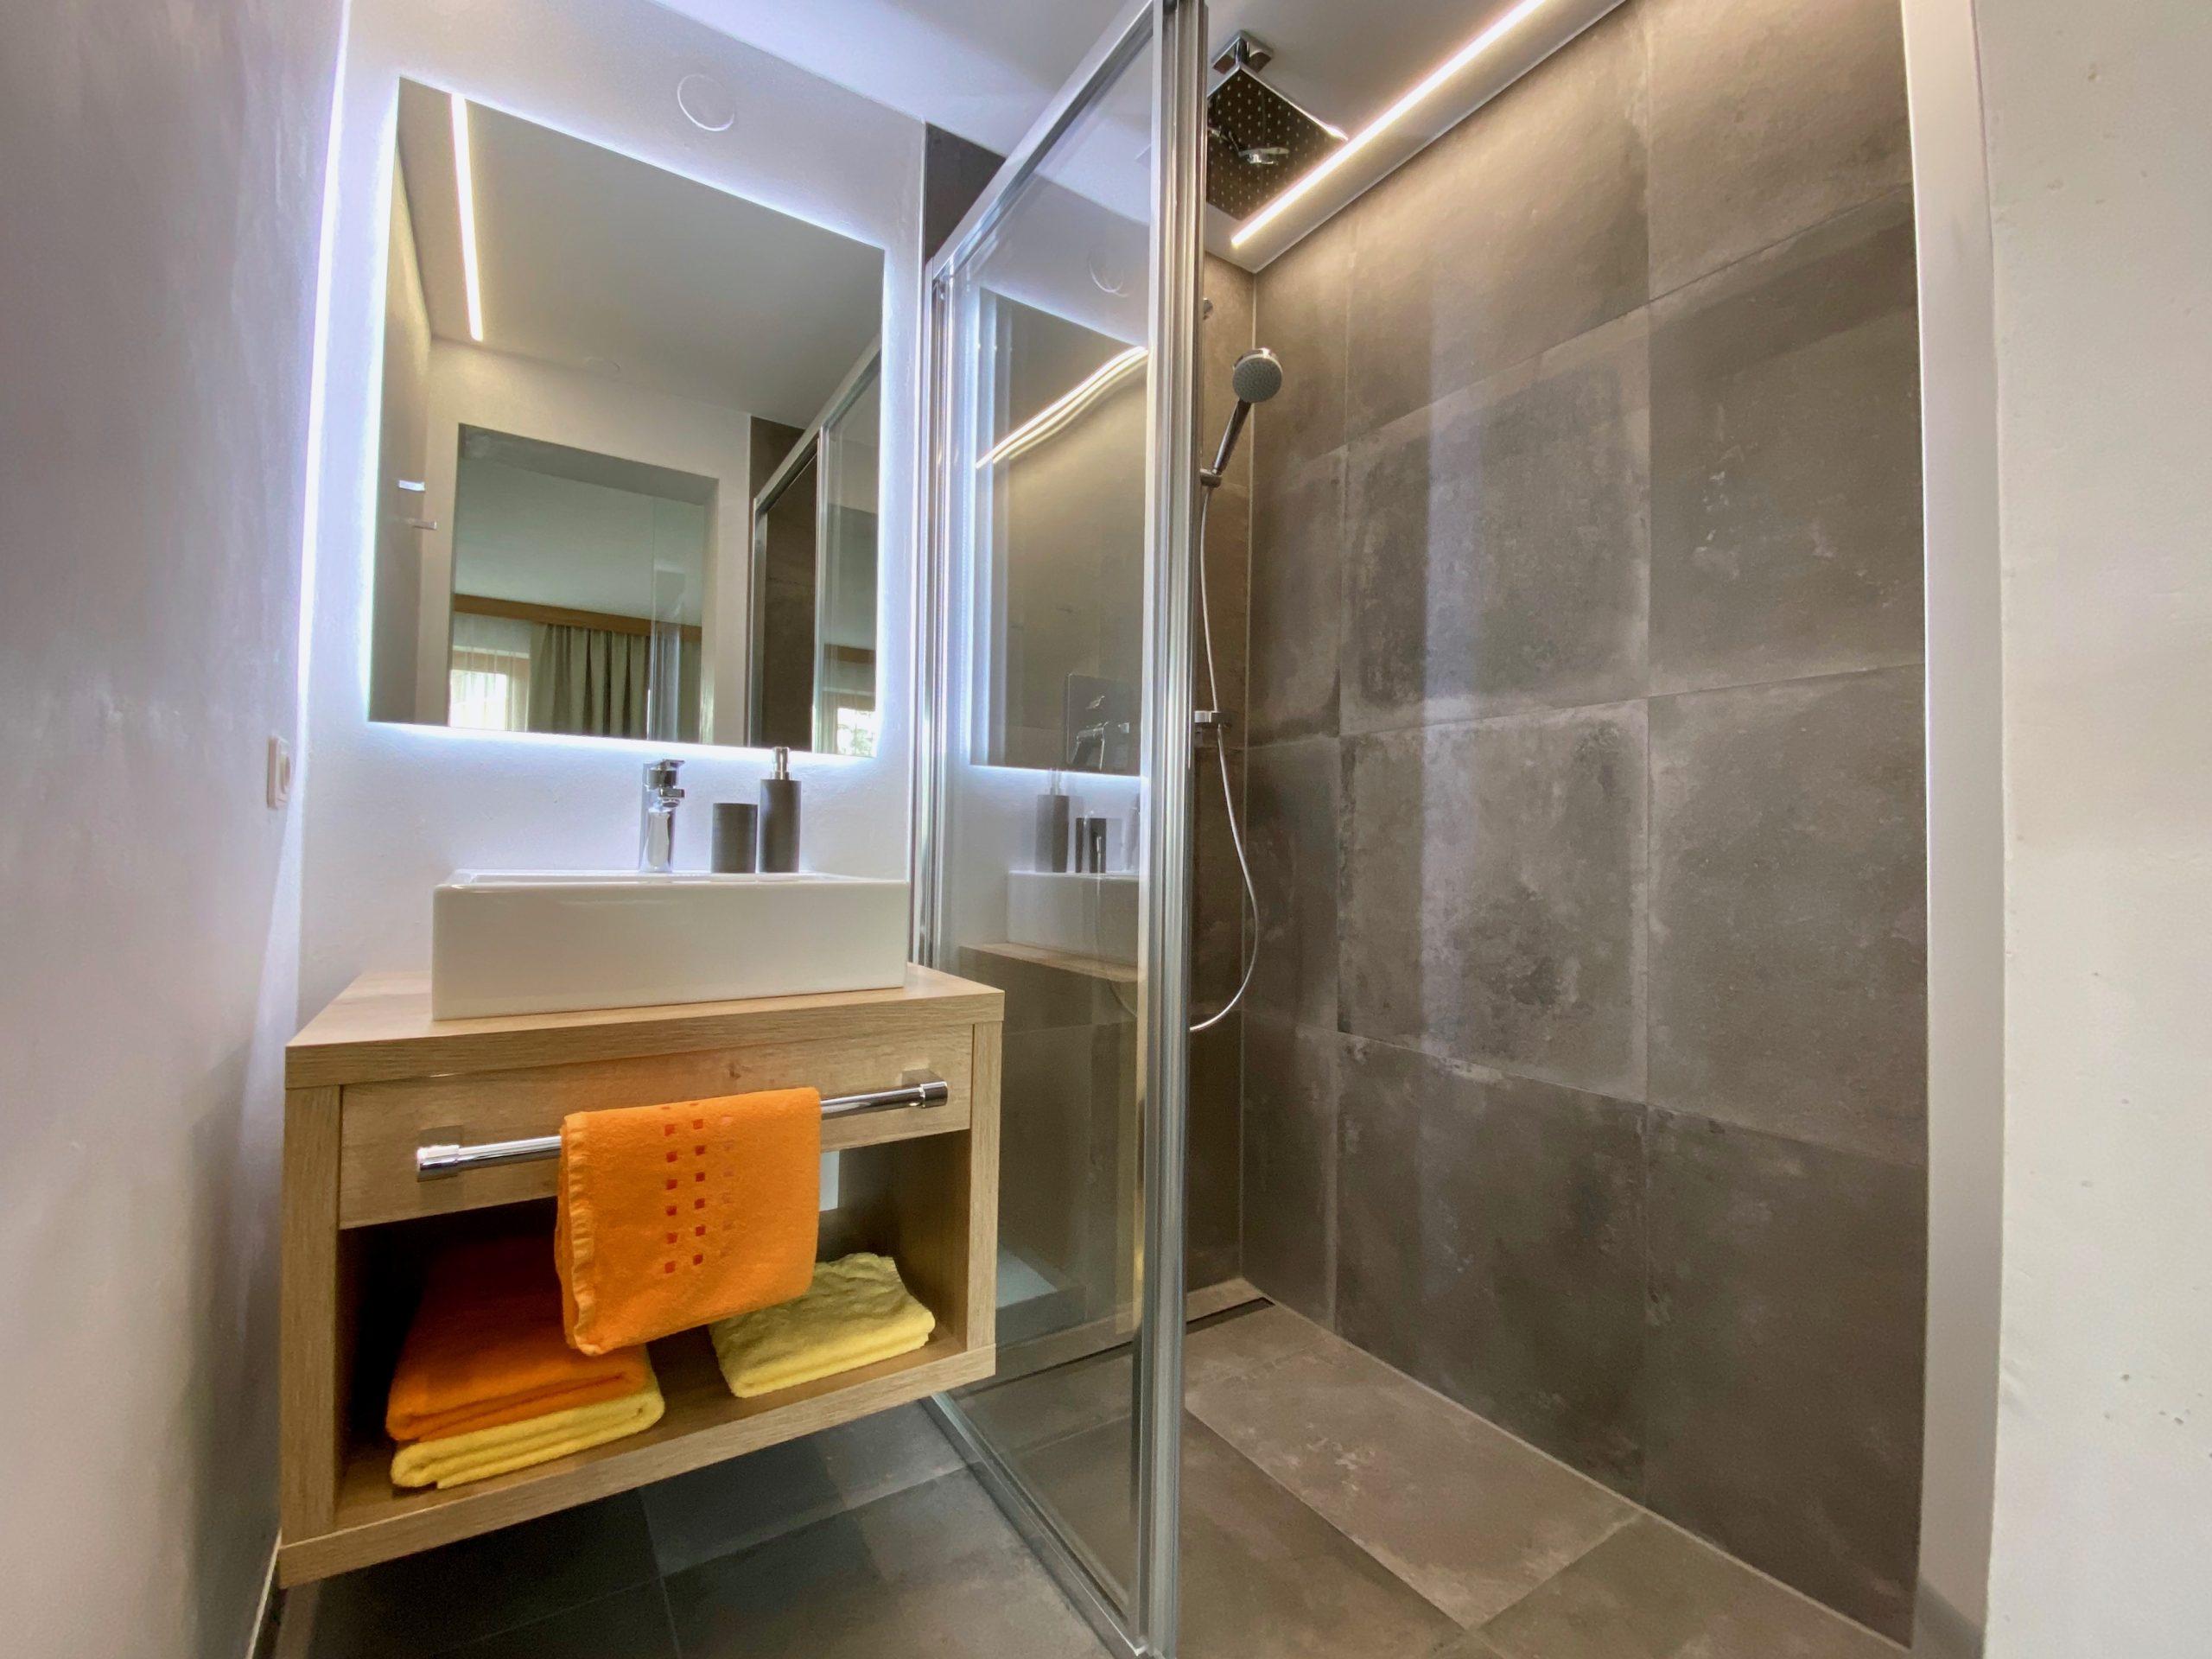 Apartment 2, bathroom